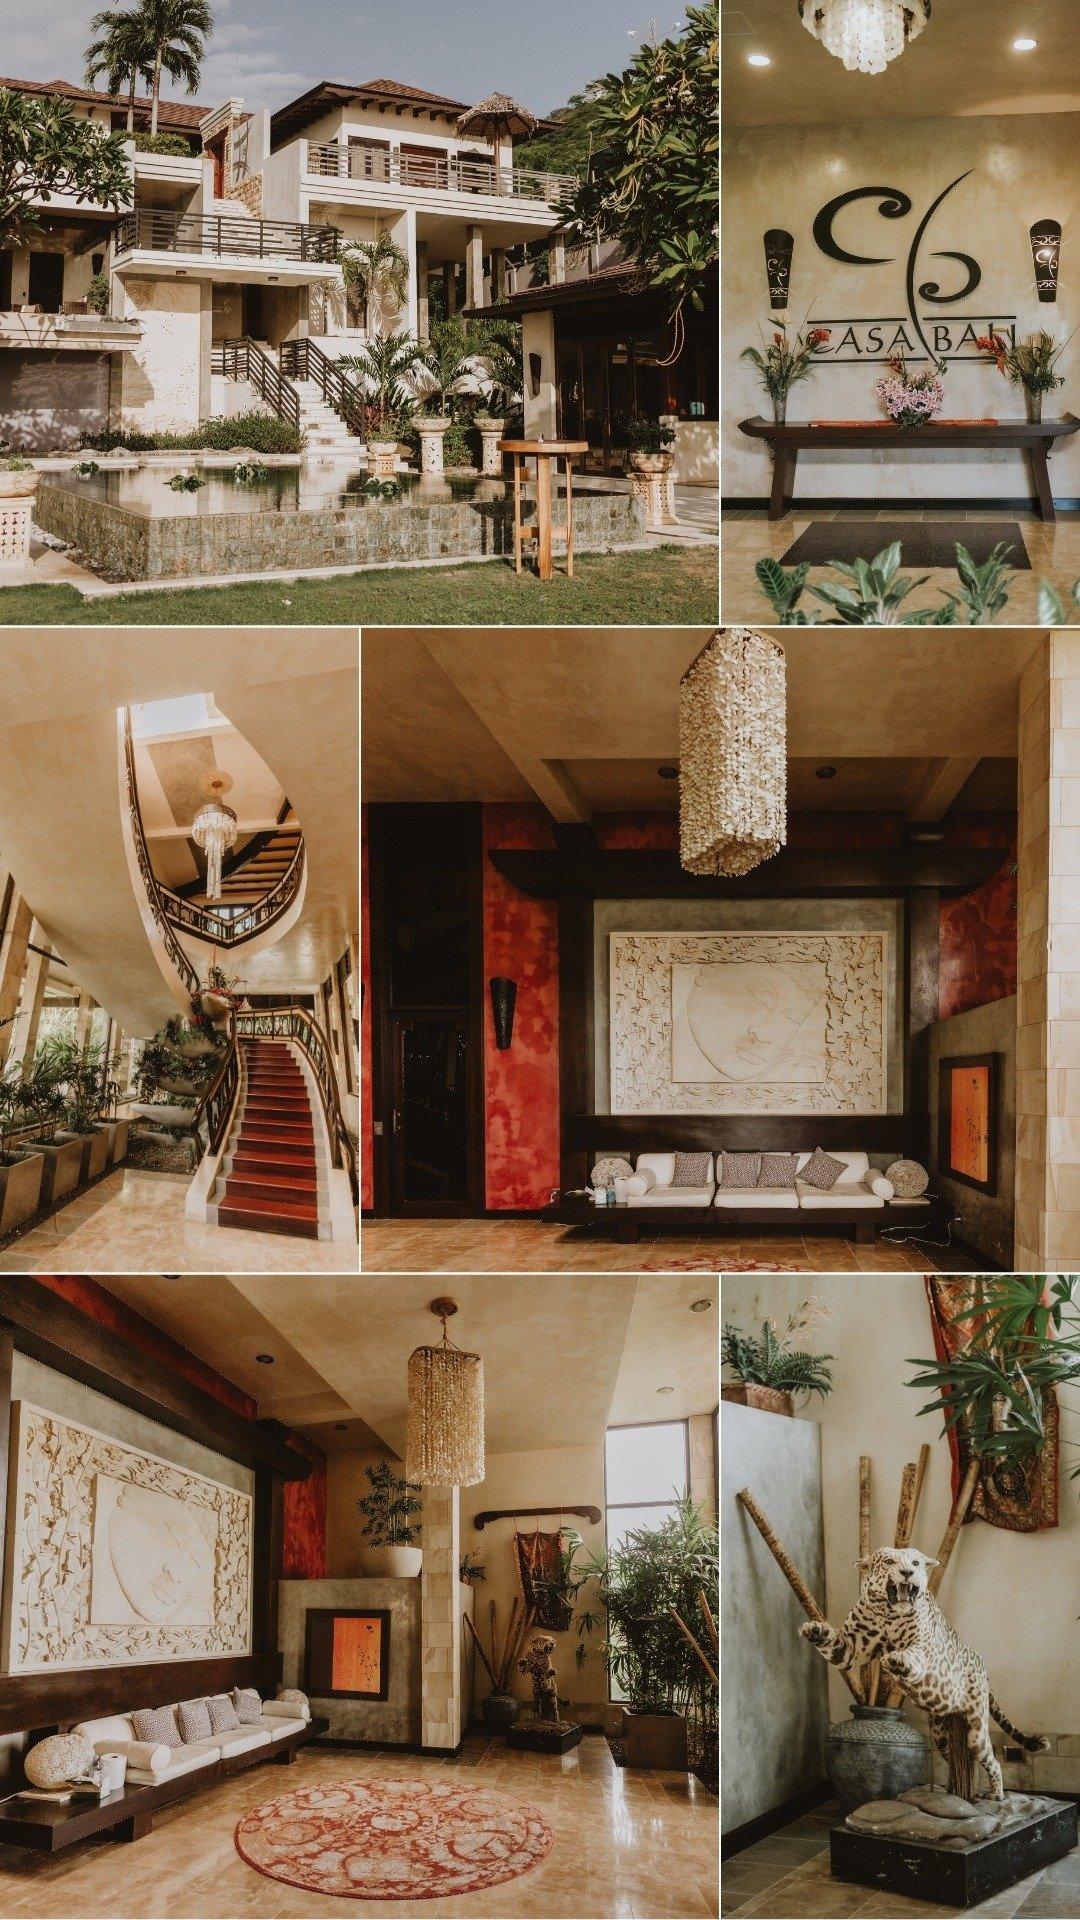 Casa bali in tamarindo costa rica gold coast